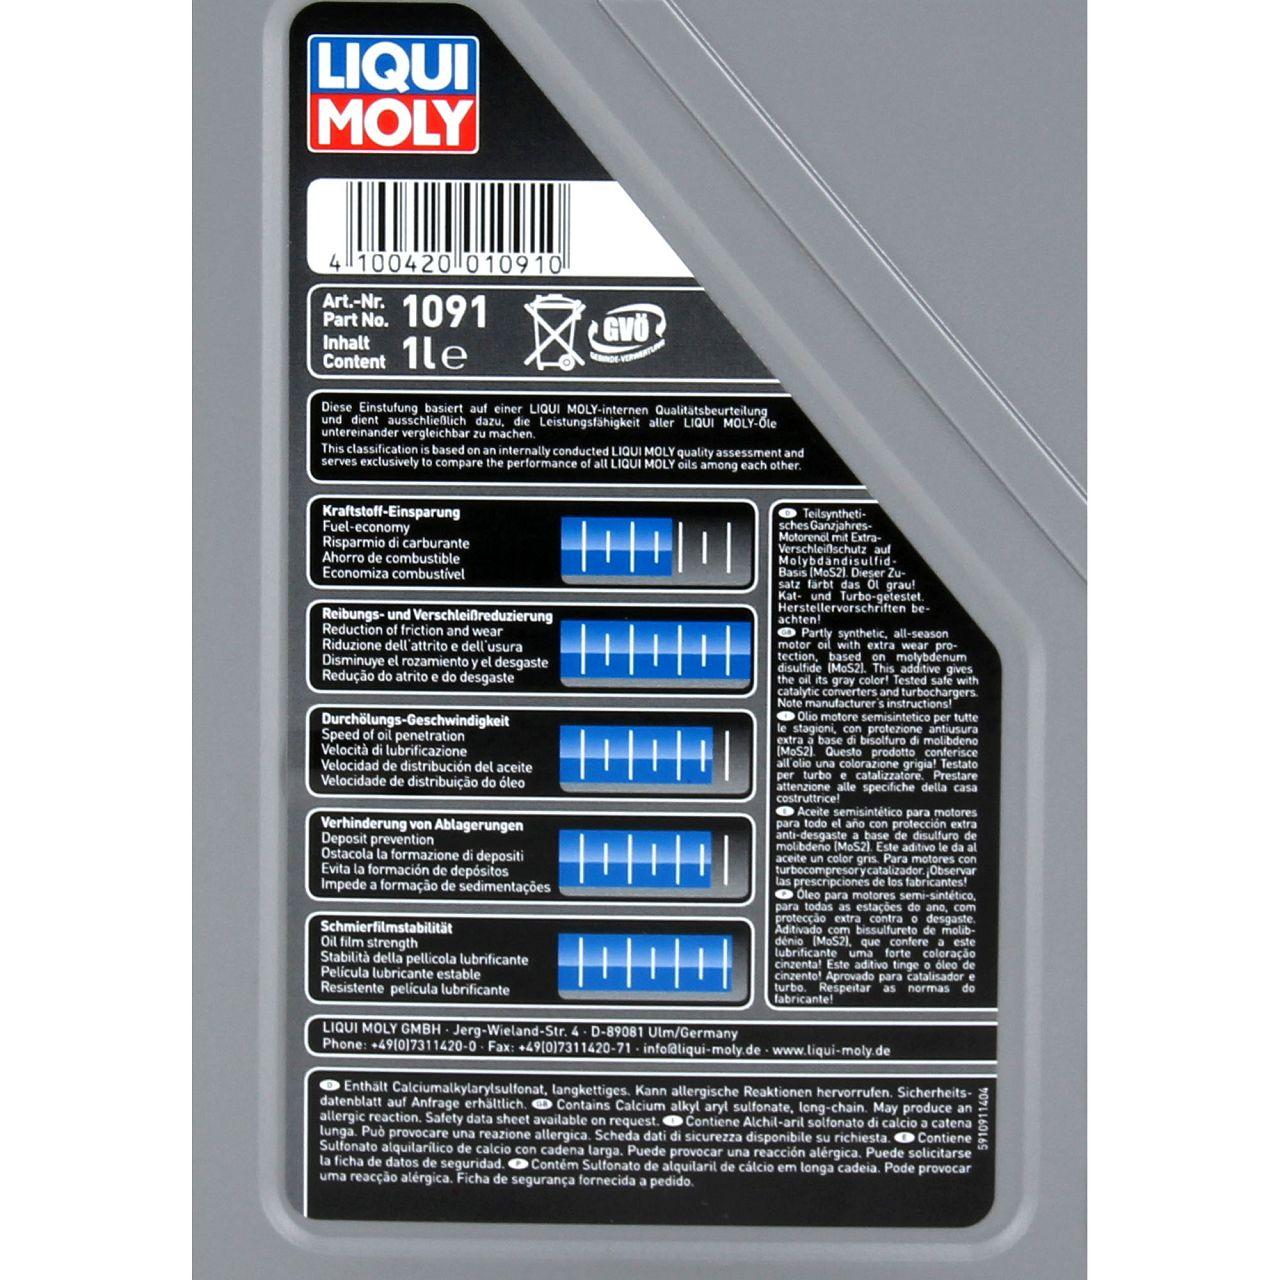 LIQUI MOLY Motoröl Öl MoS2 LEICHTLAUF 10W40 10W-40 1L 1Liter 1091